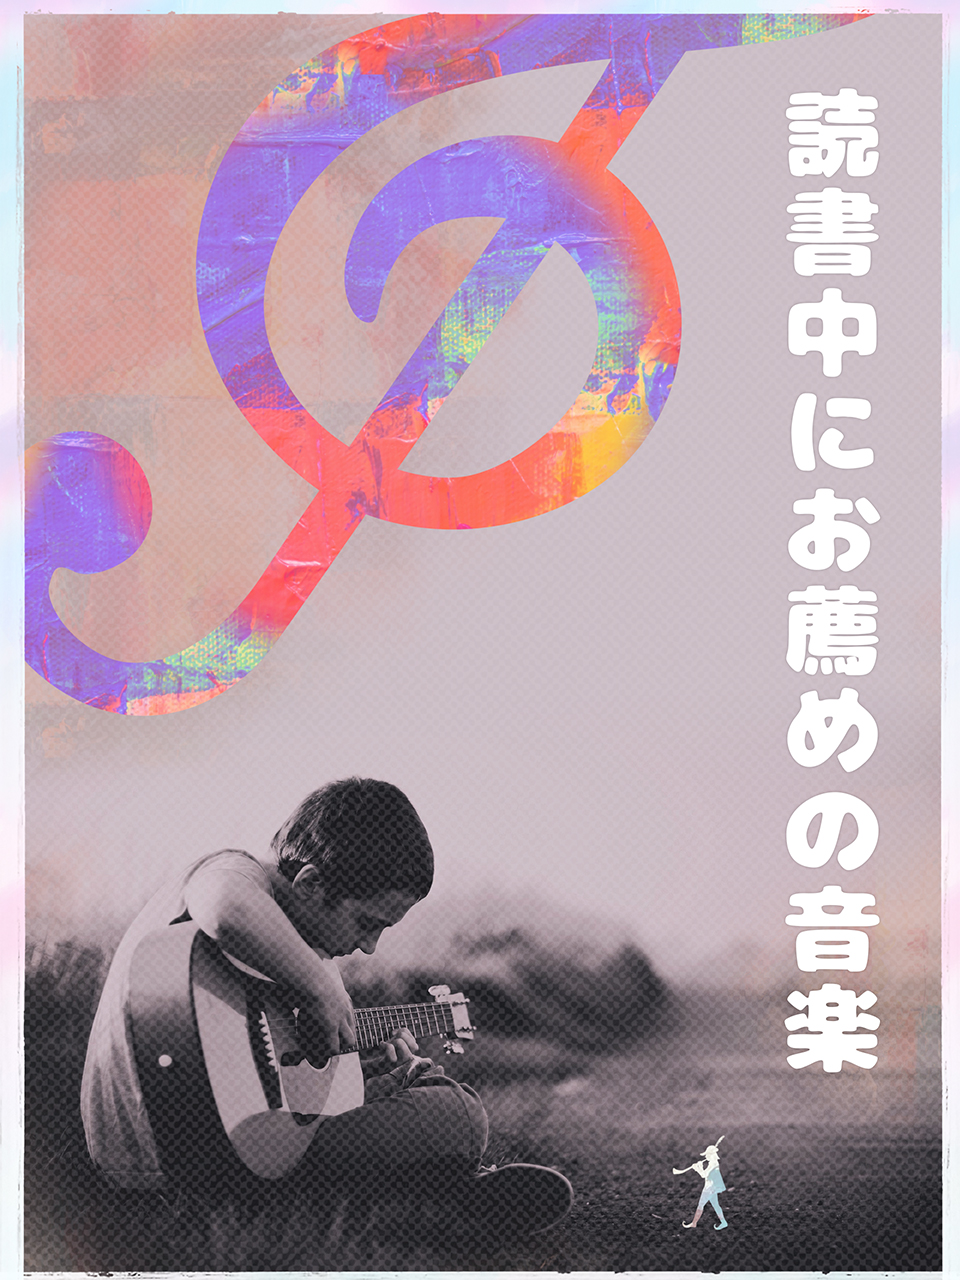 bookimage01901sono136 2 - 読書中にお薦めの音楽